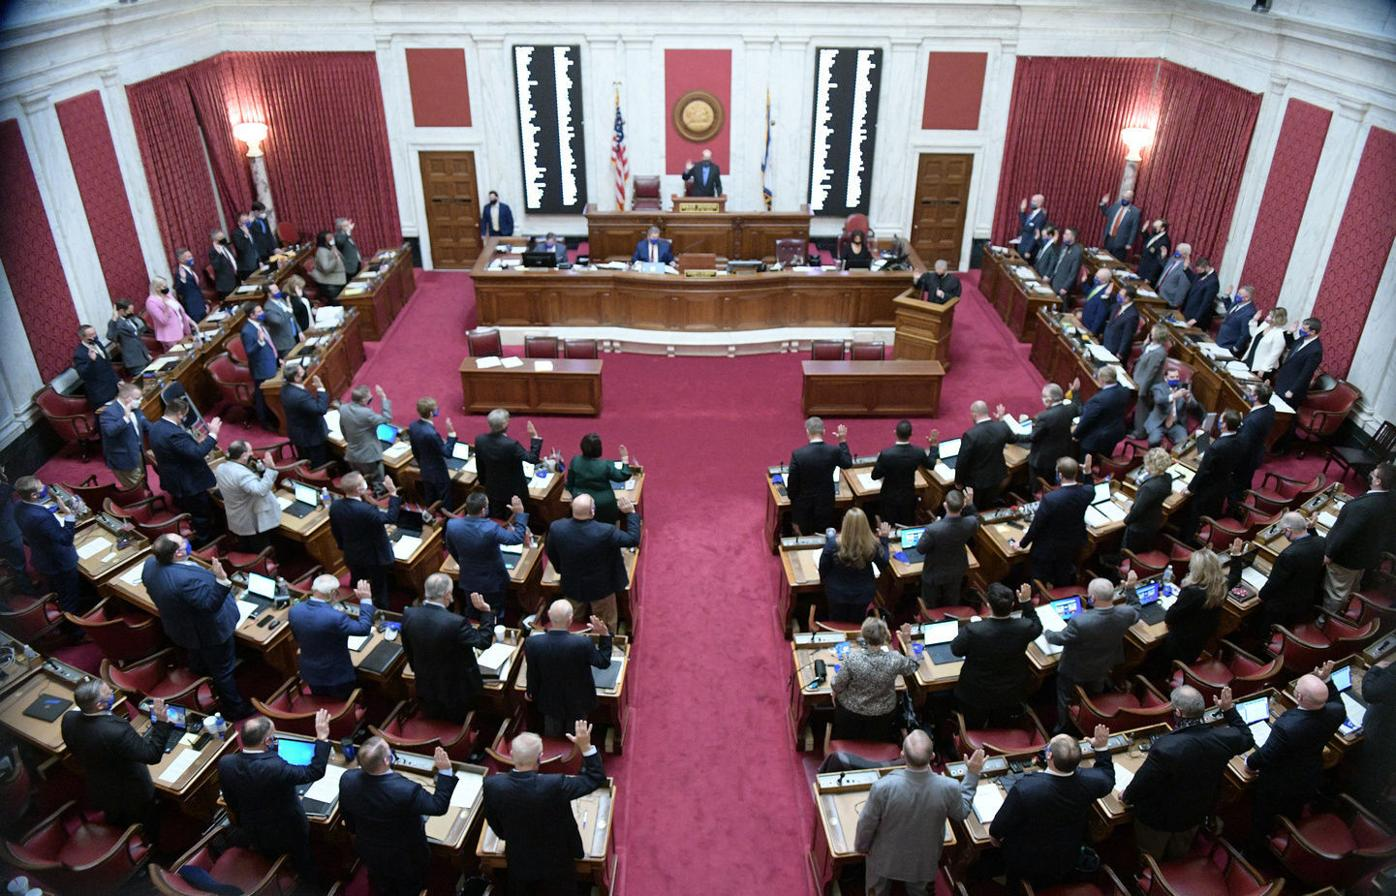 WV Legislature - House Floor